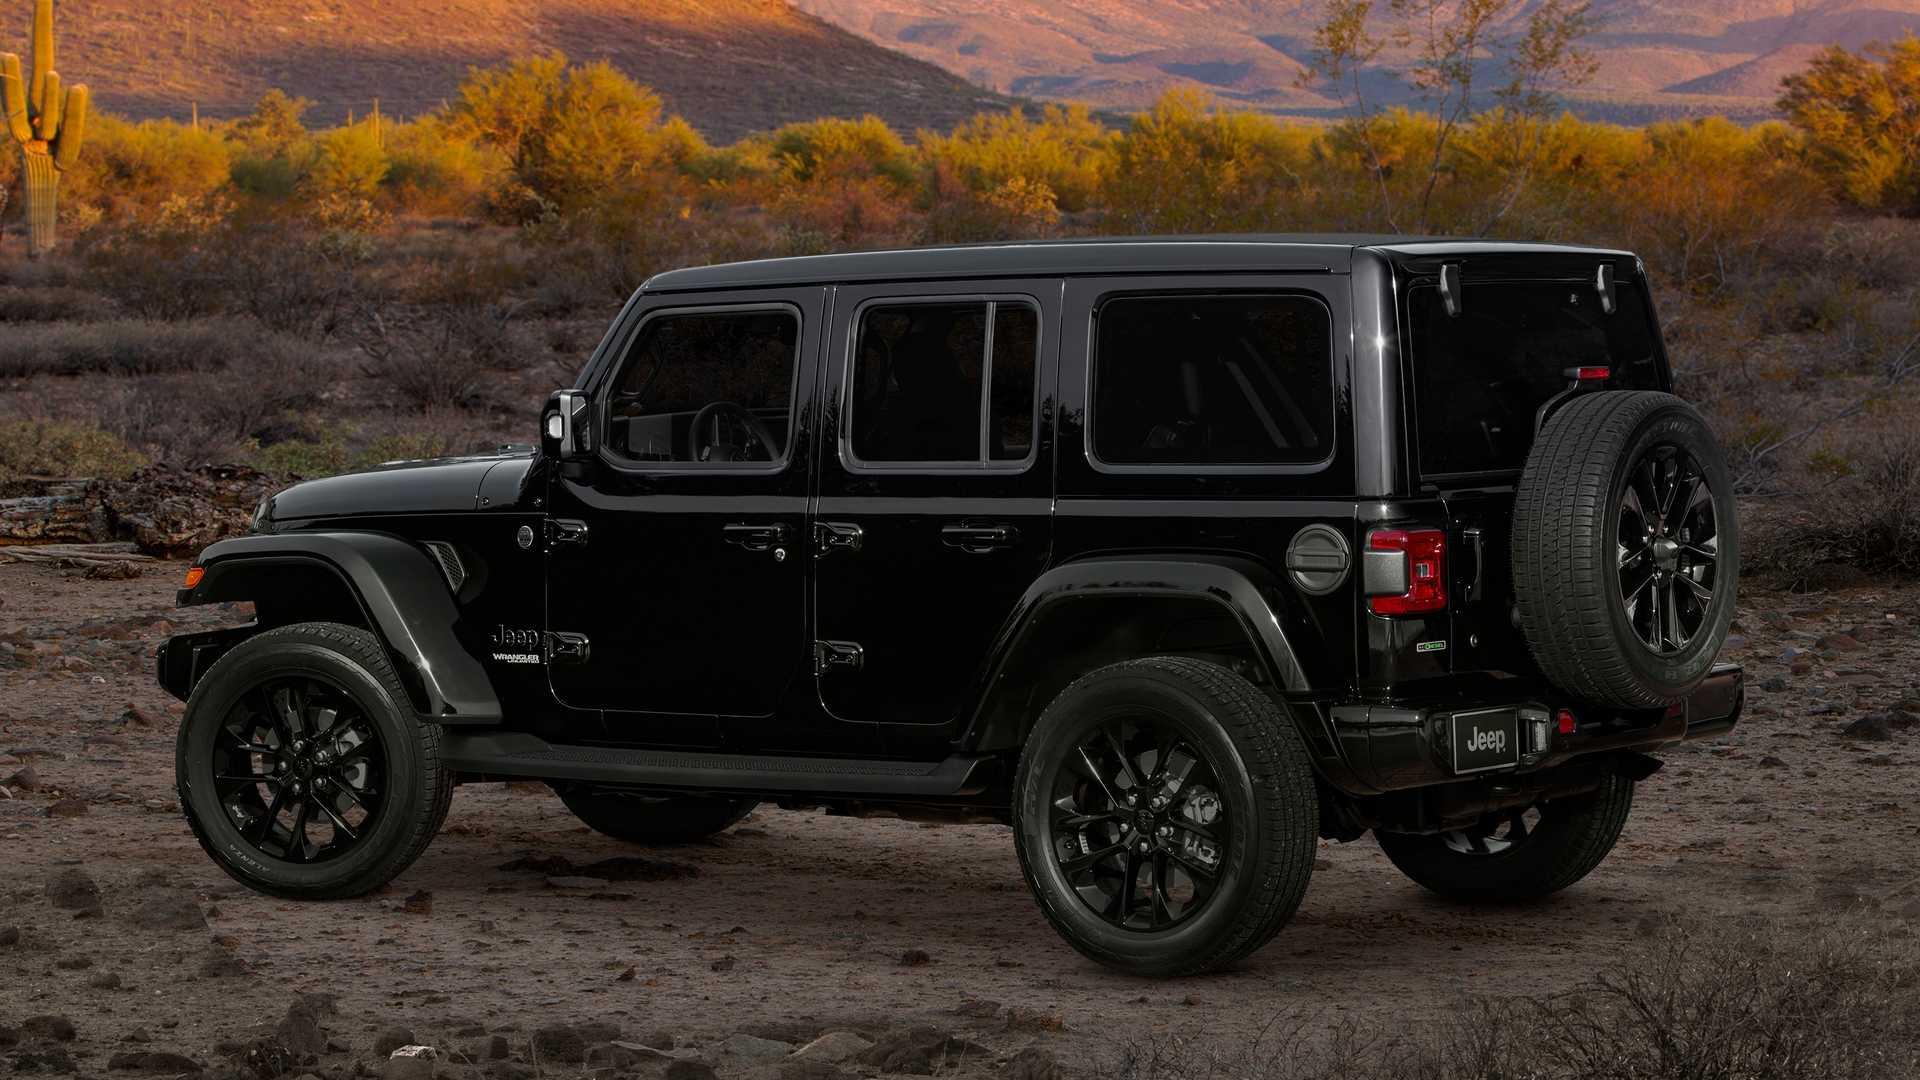 2020-jeep-wrangler-high-altitude-3